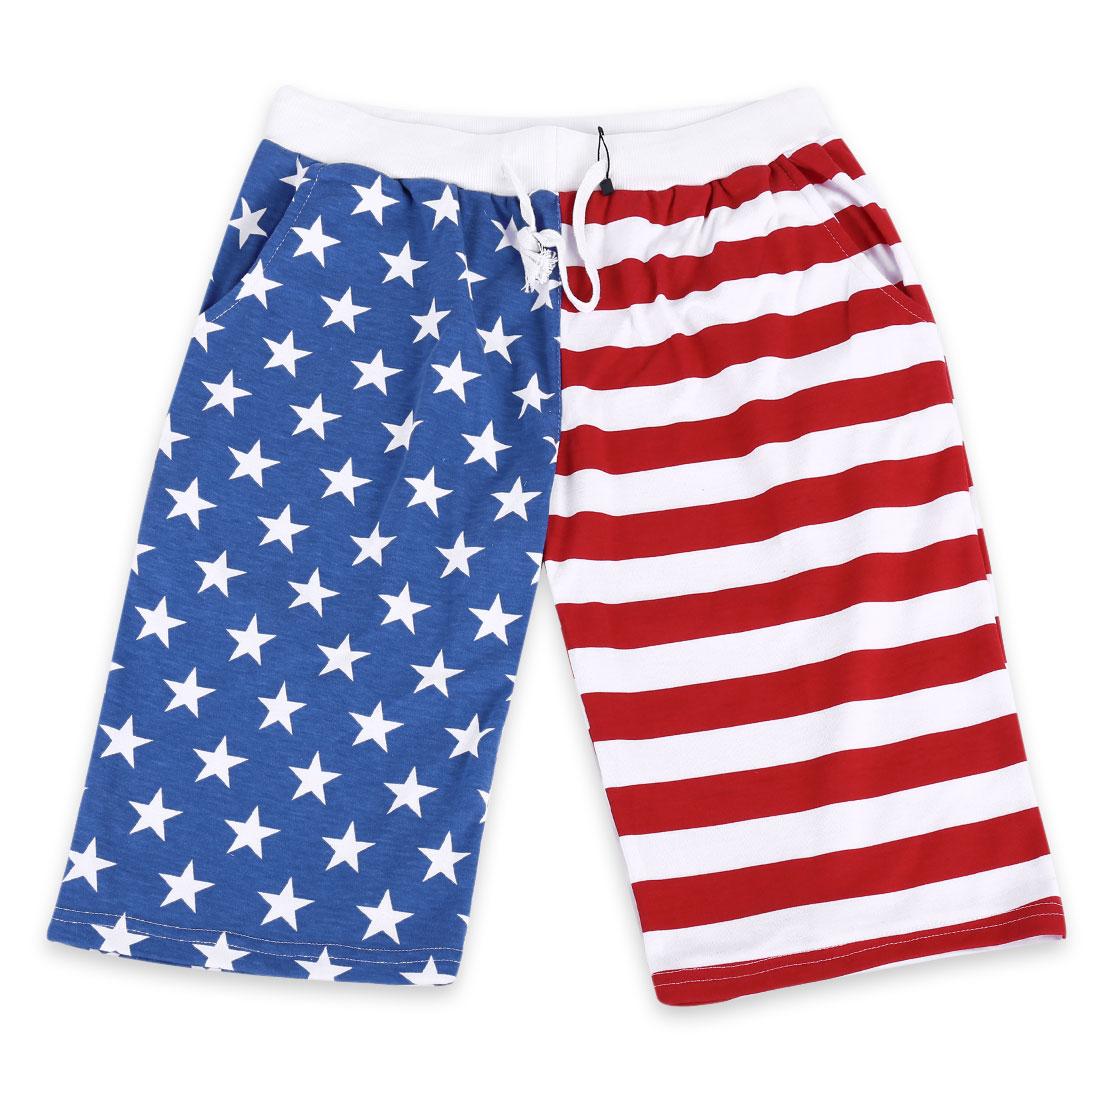 Men Adjustable Strap Waist Stripes Stars Pattern Shorts Blue Red S